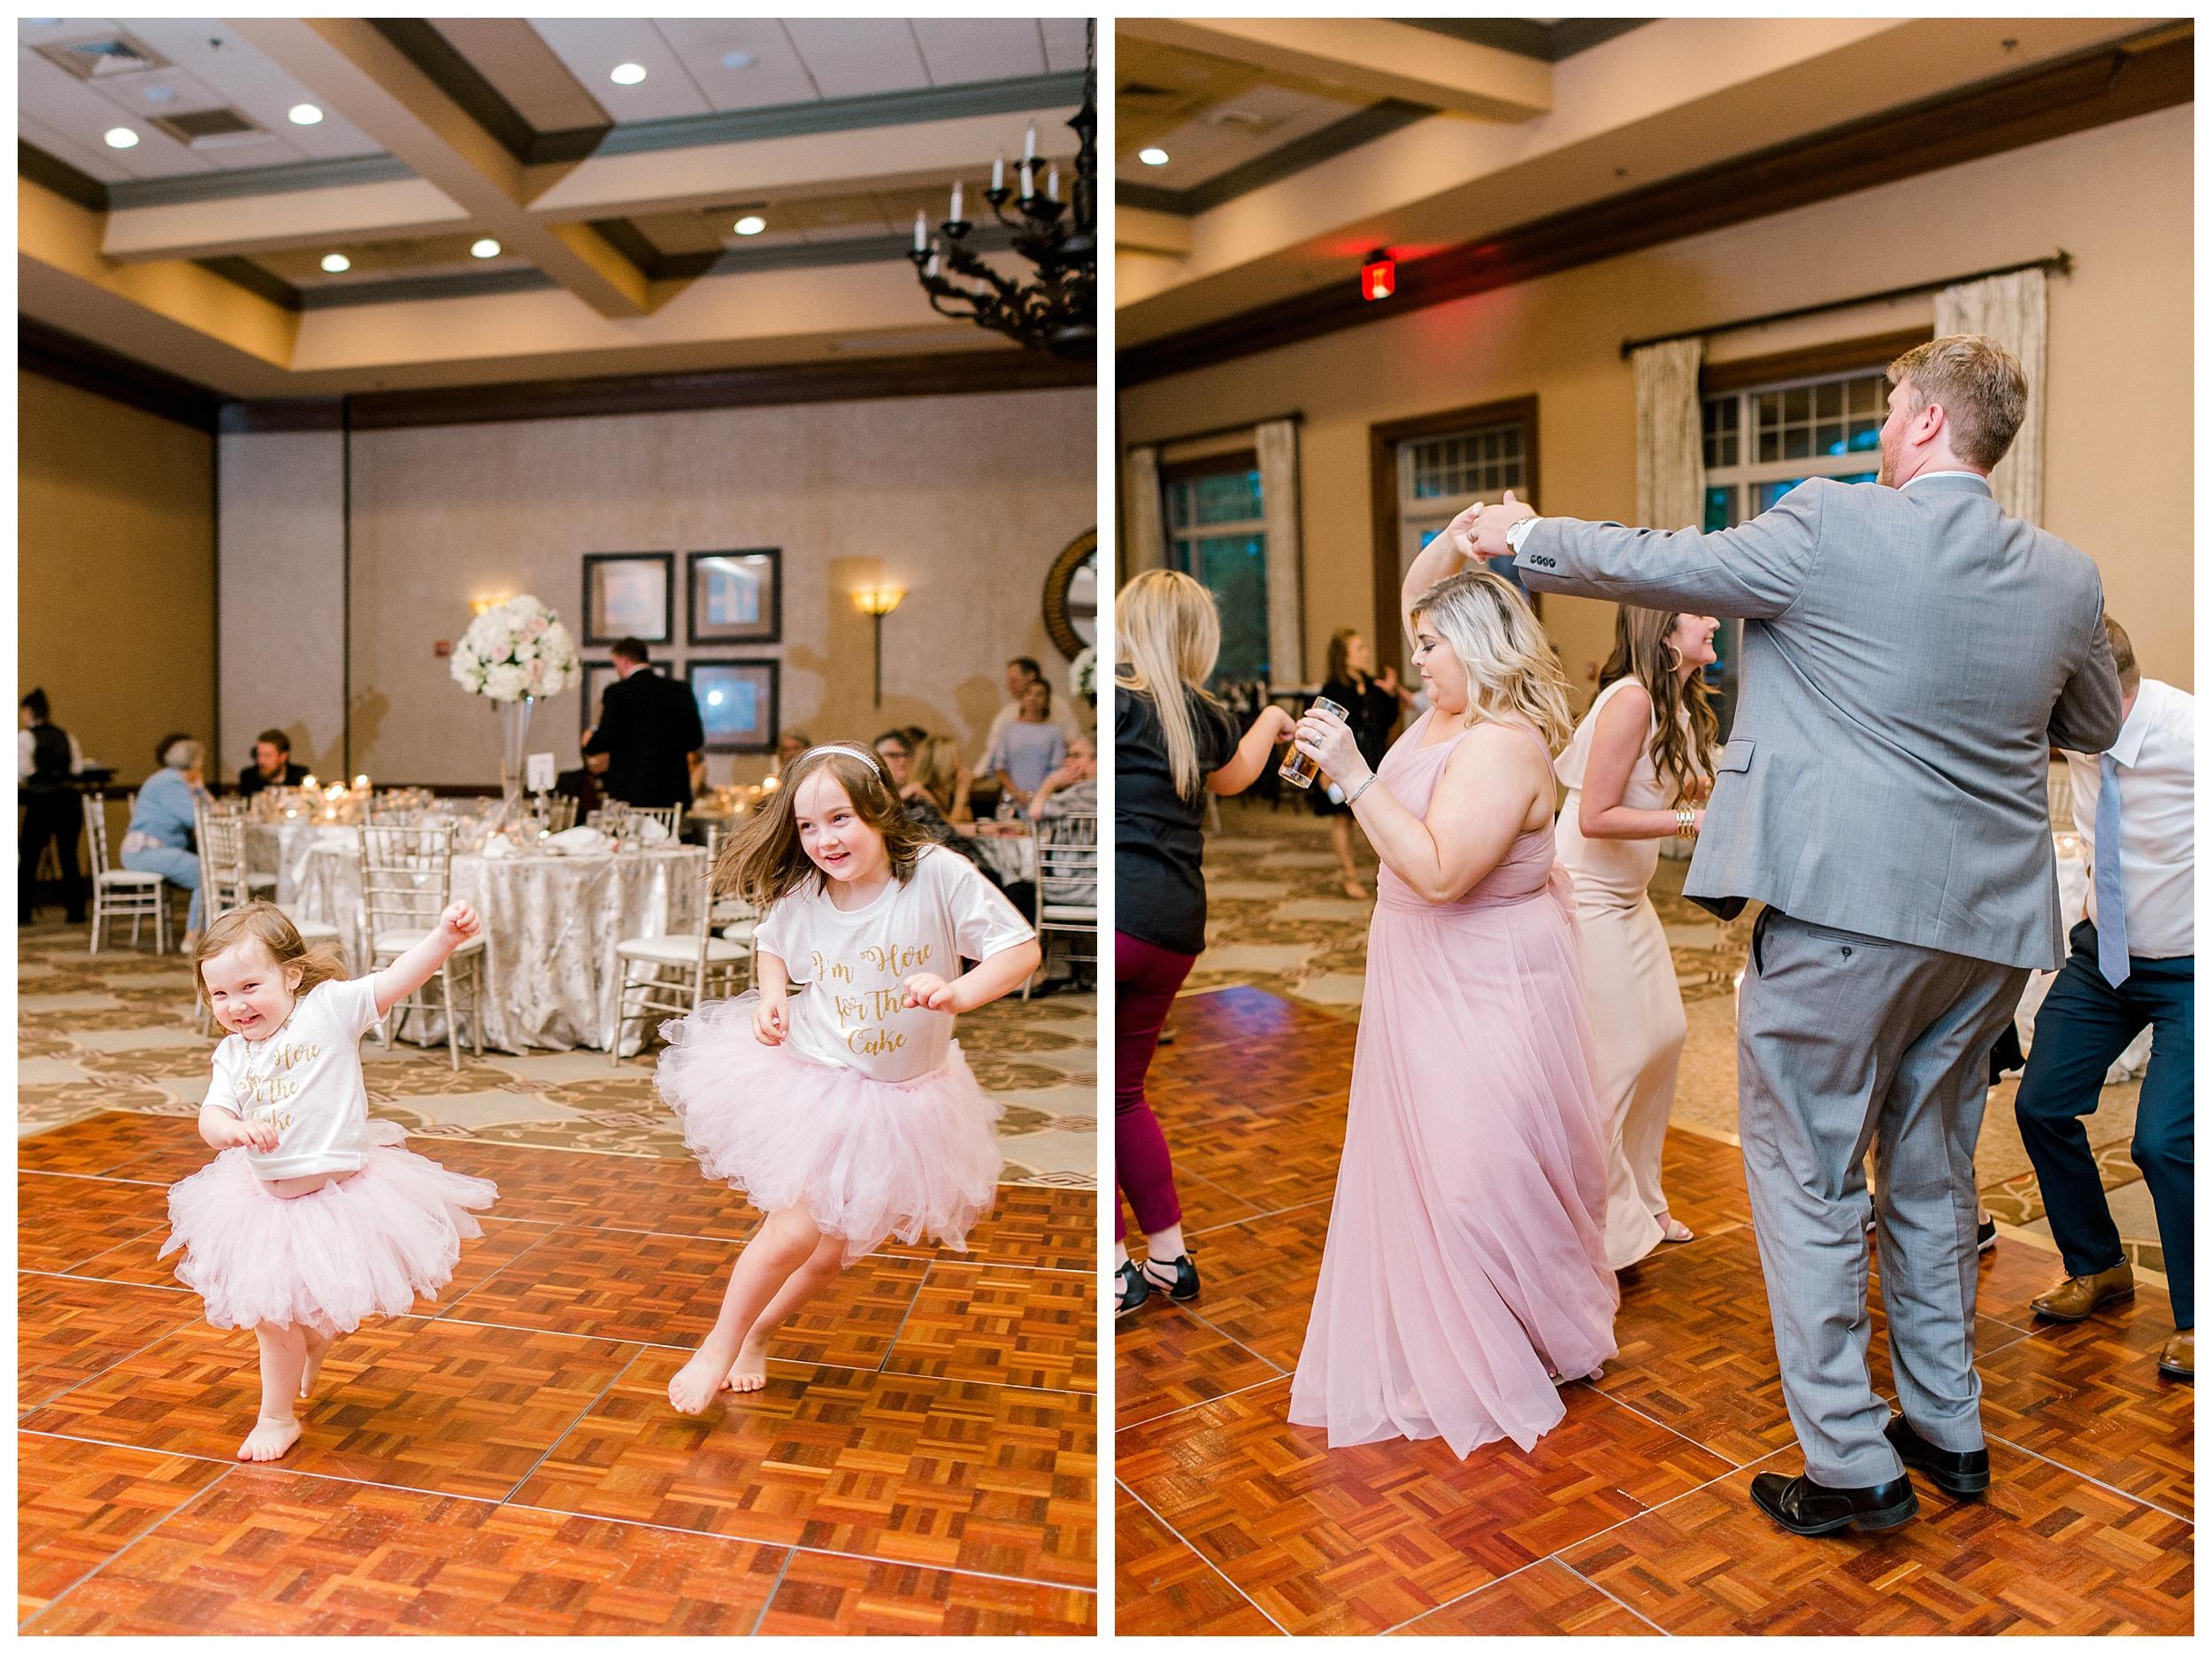 Lansdowne Resort Wedding | Virginia Film Wedding Photographer Kir Tuben_0068.jpg